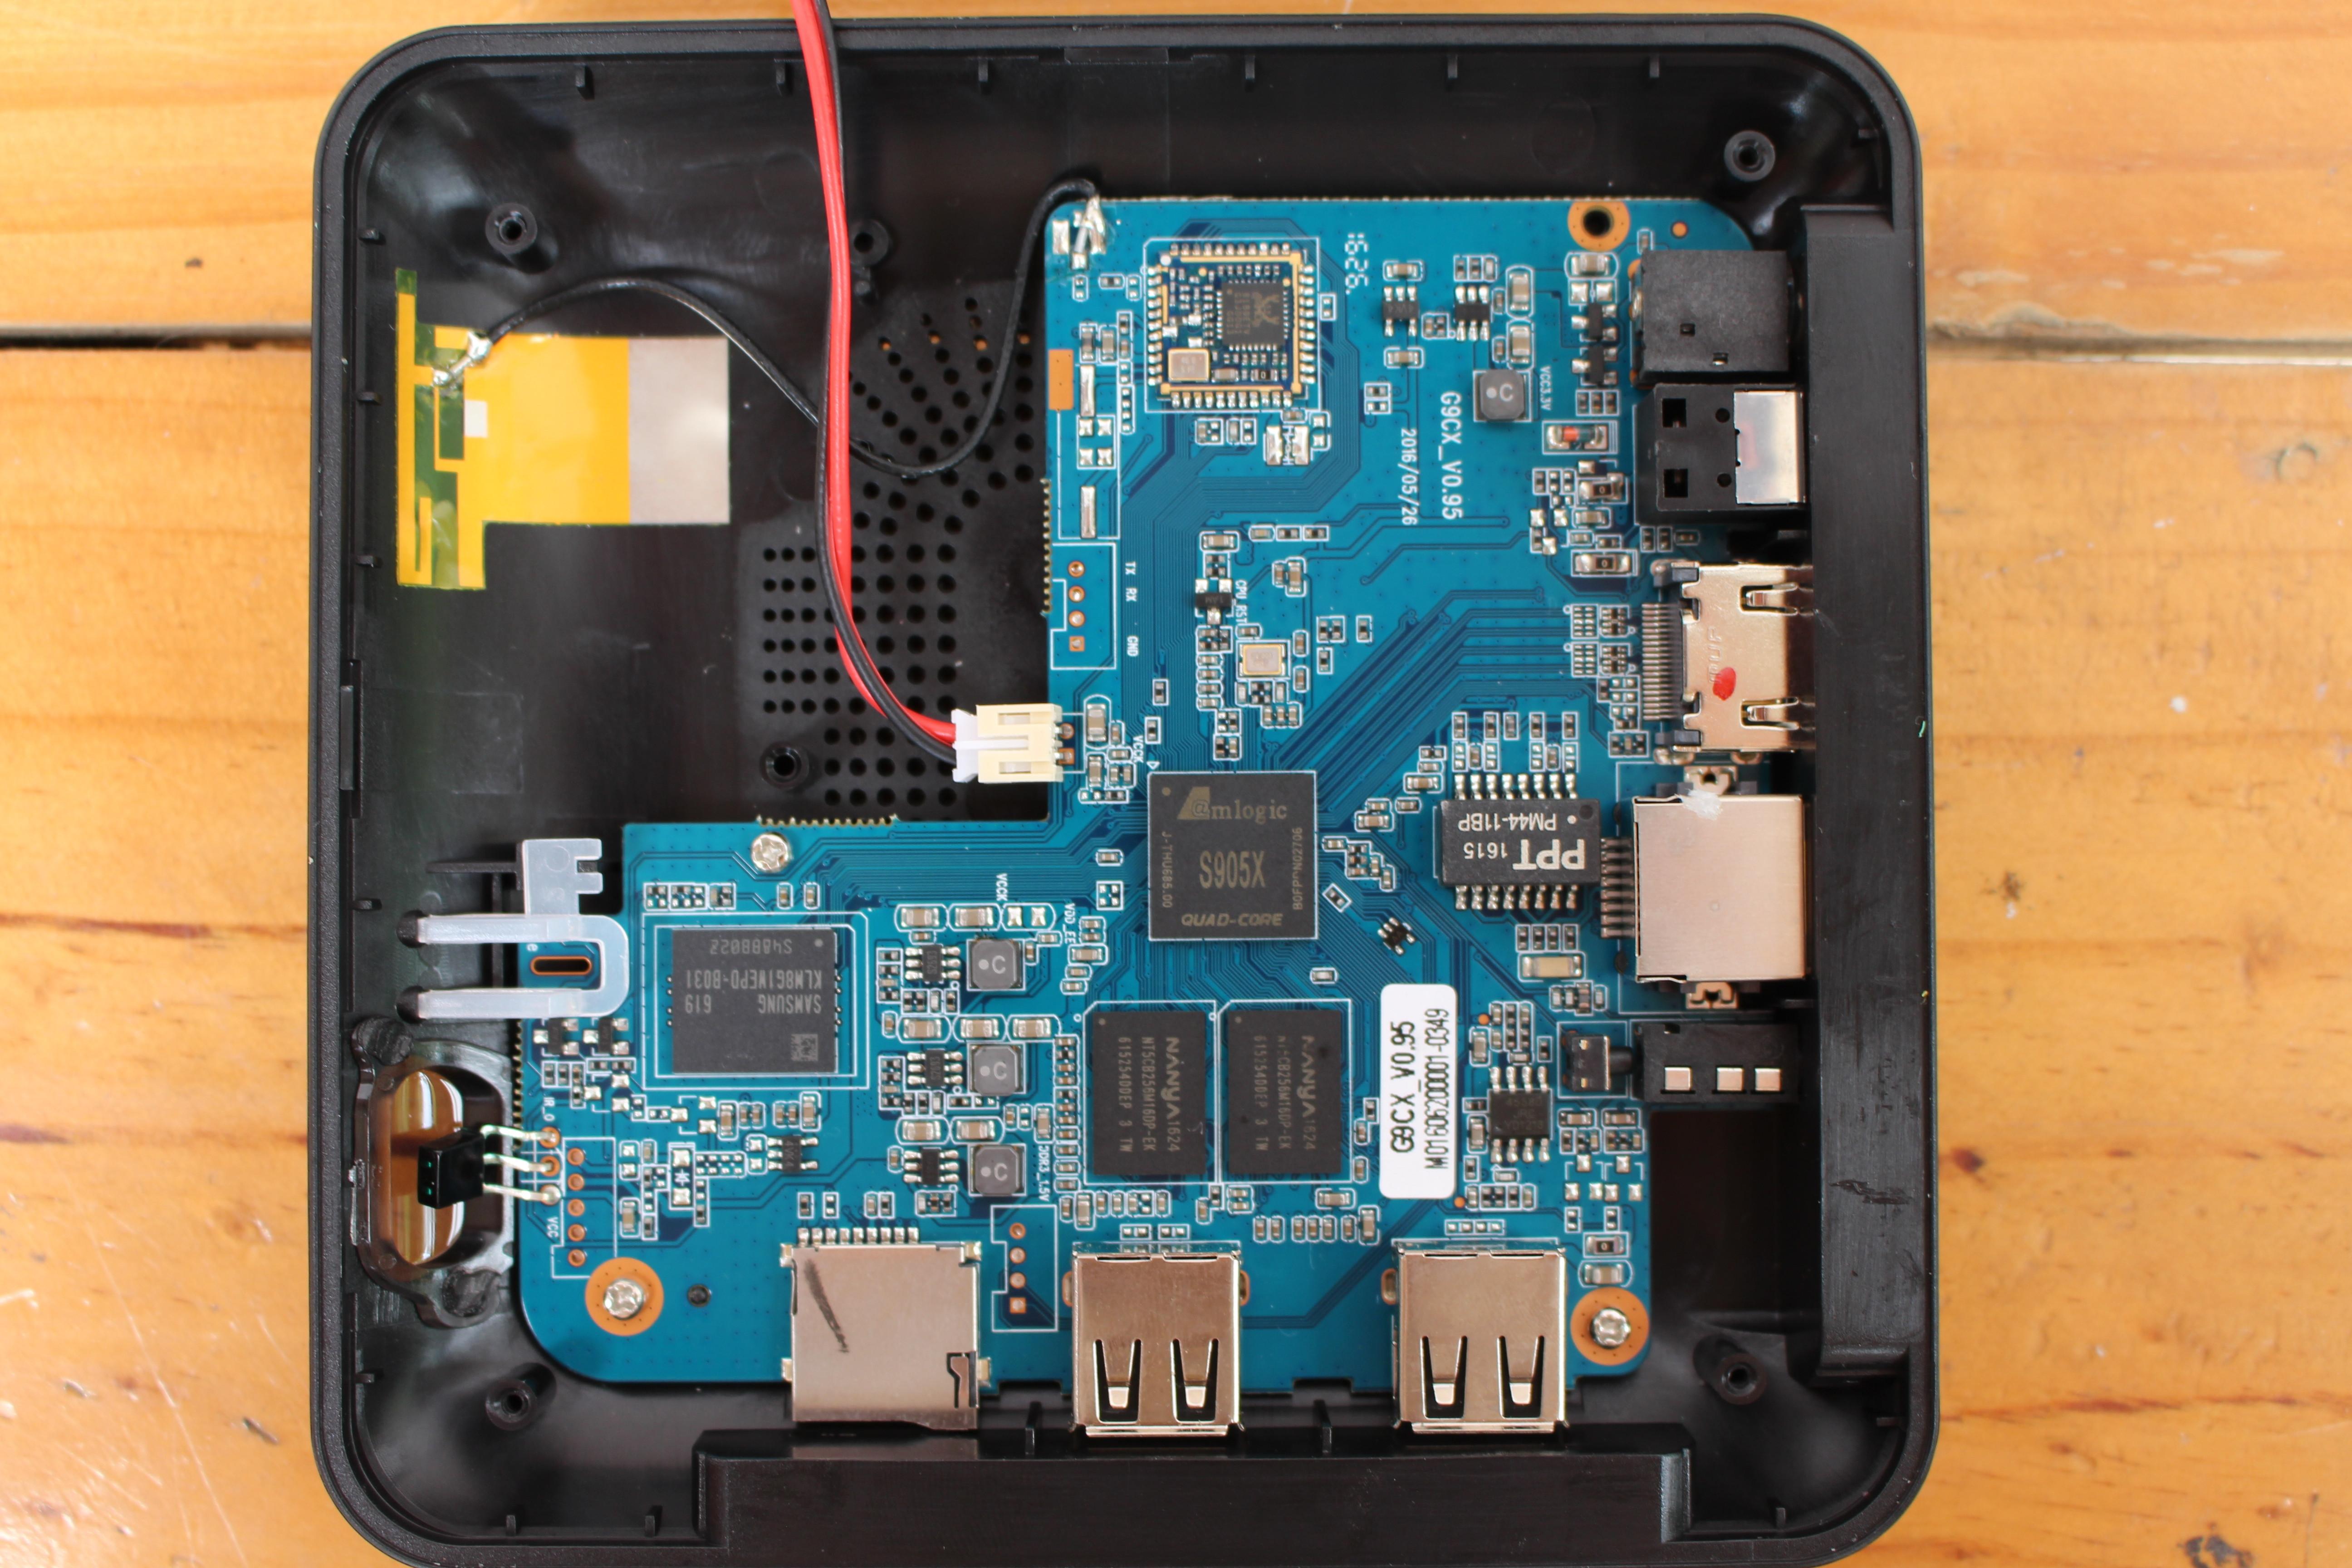 Mxq Pro G9cx Android 6 0 Tv Box Review Part 1 Specs